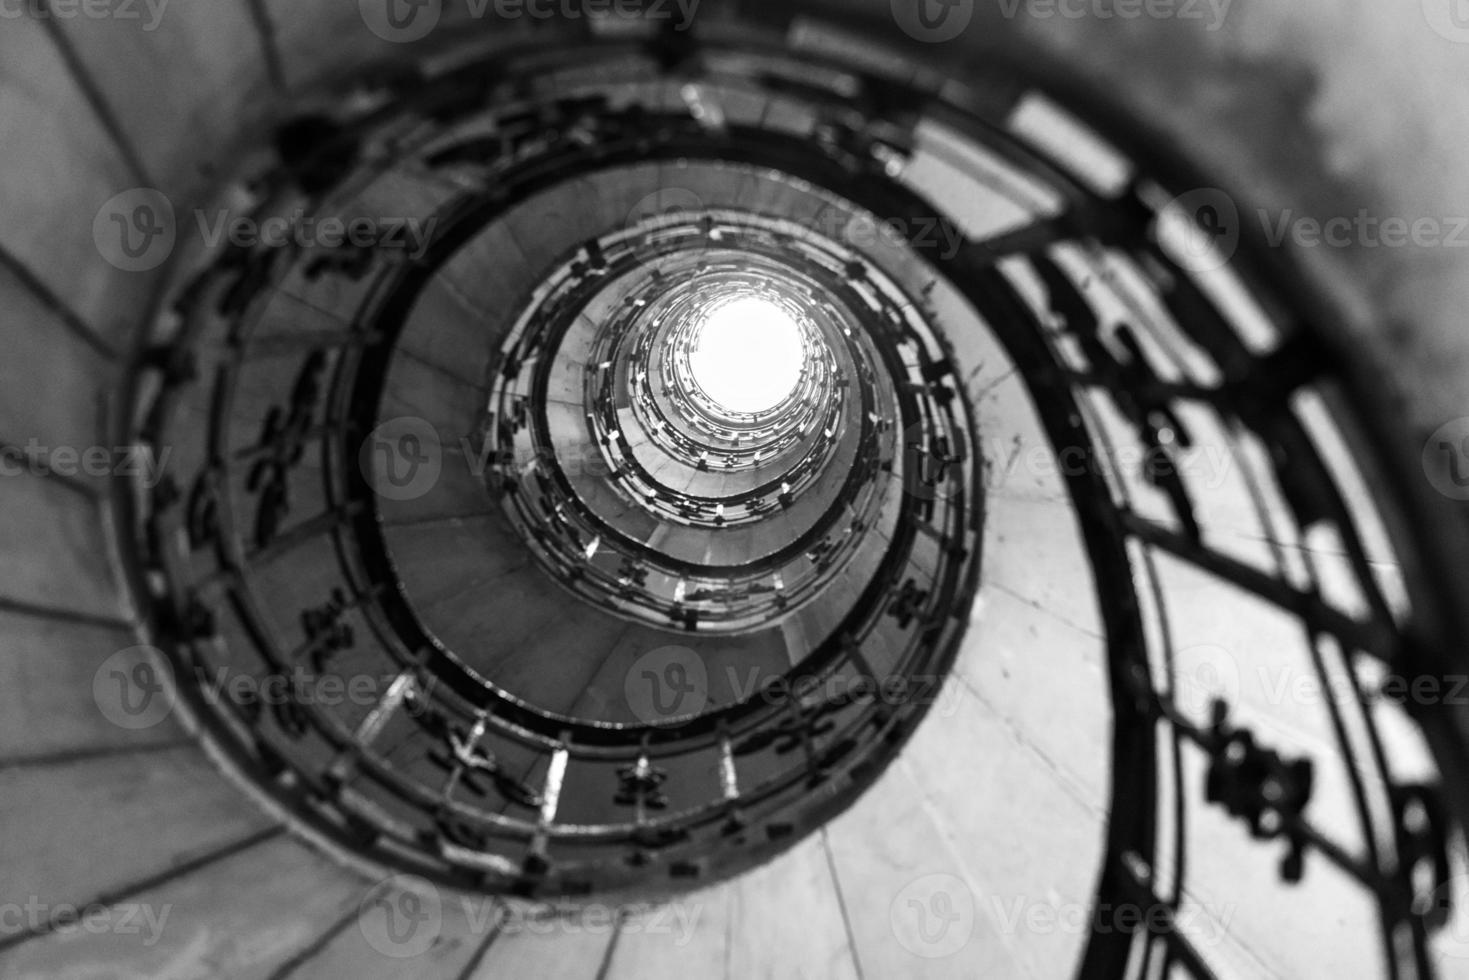 spiraltrappa i st. stephen basilika i budapest foto